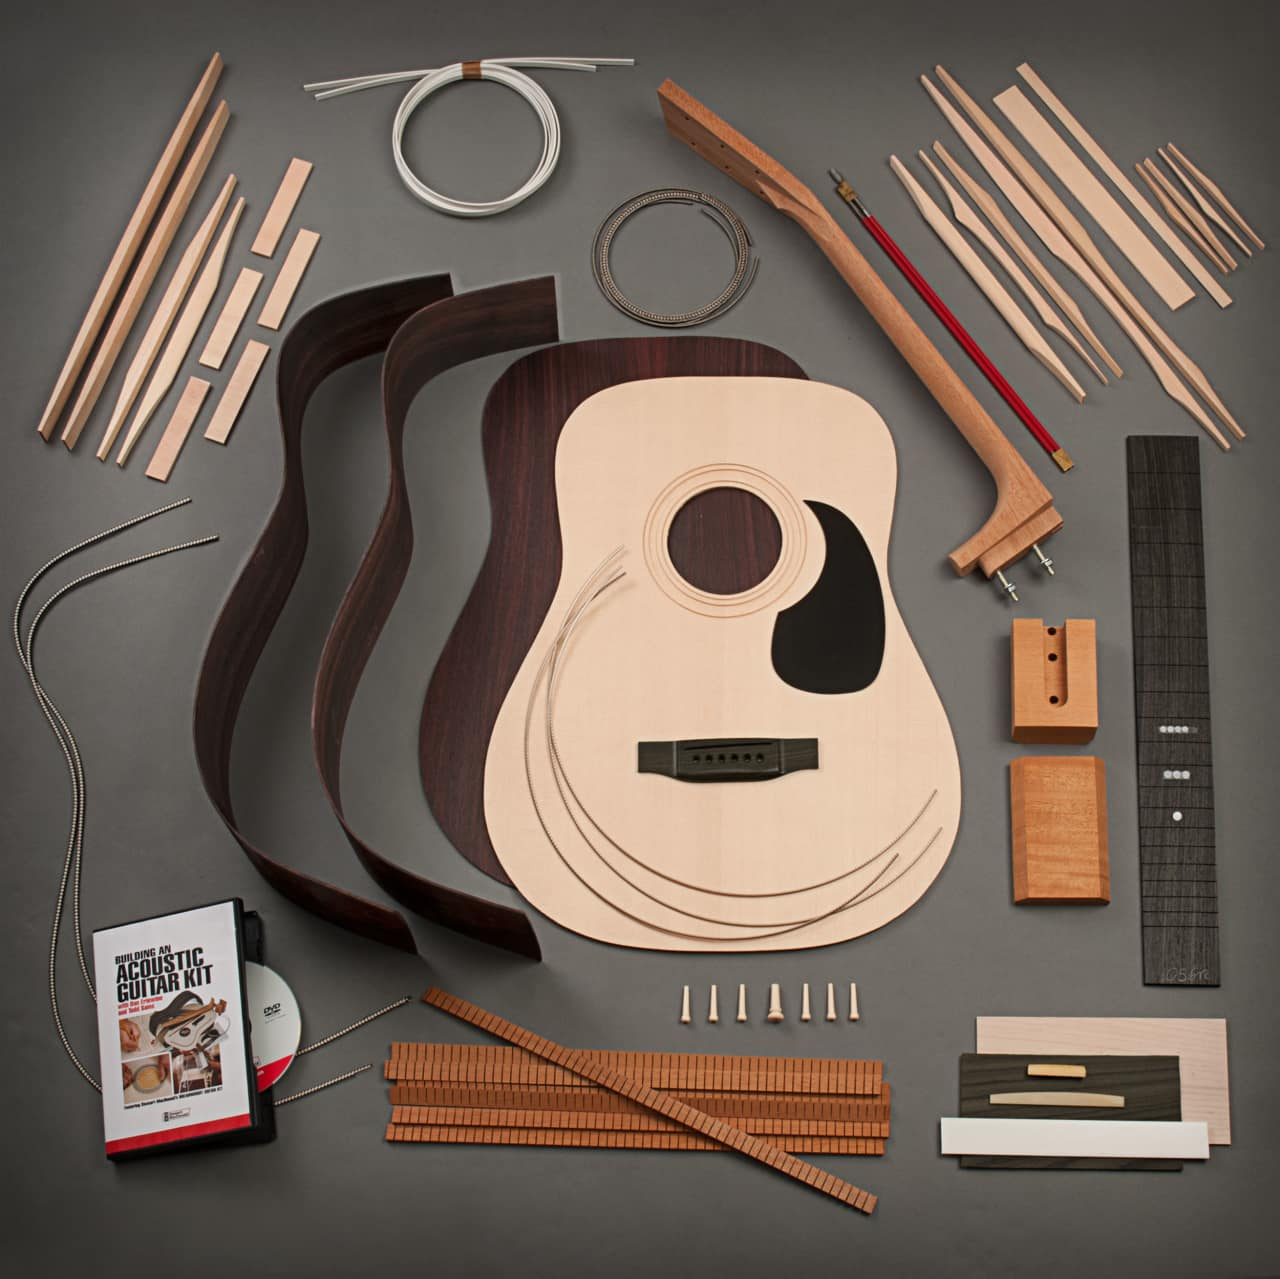 stewmac dreadnought acoustic guitar kit bolt on neck. Black Bedroom Furniture Sets. Home Design Ideas